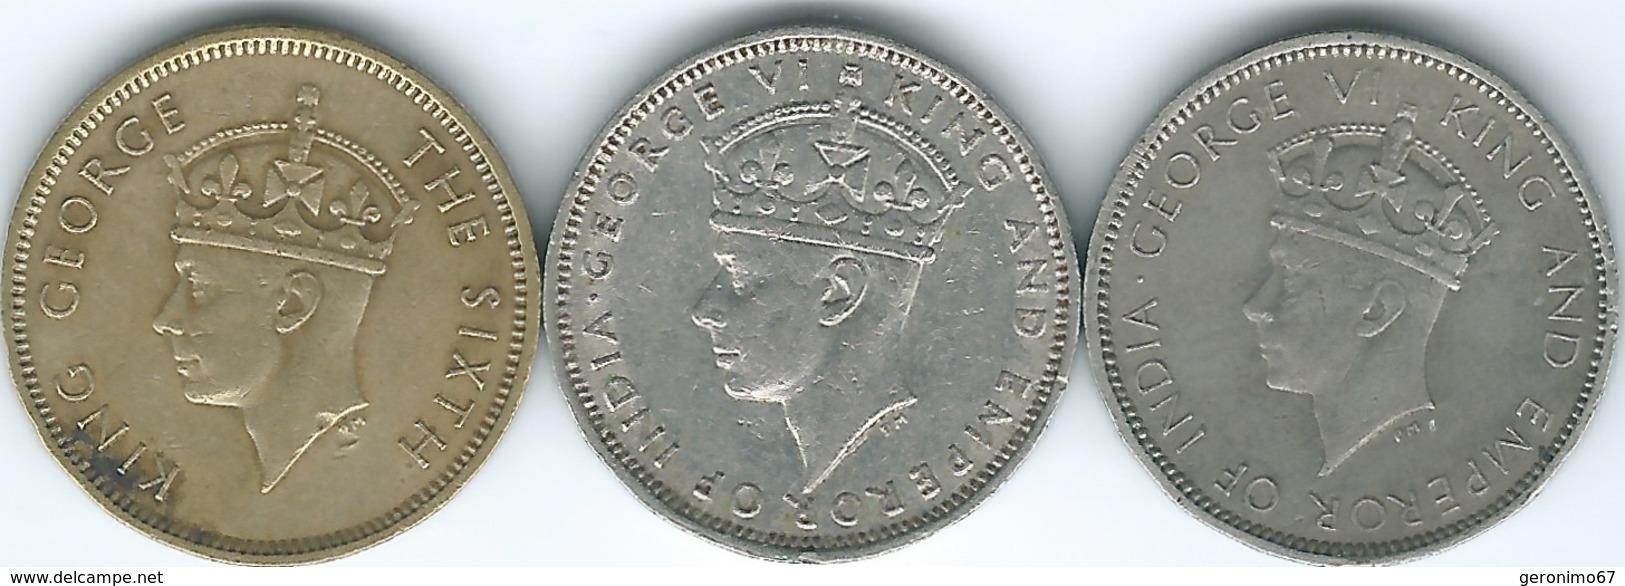 Hong Kong - George VI - 10 Cents - 1937 (KM21) 1938 (KM23) & 1949 (KM25) Security Edges - Hong Kong